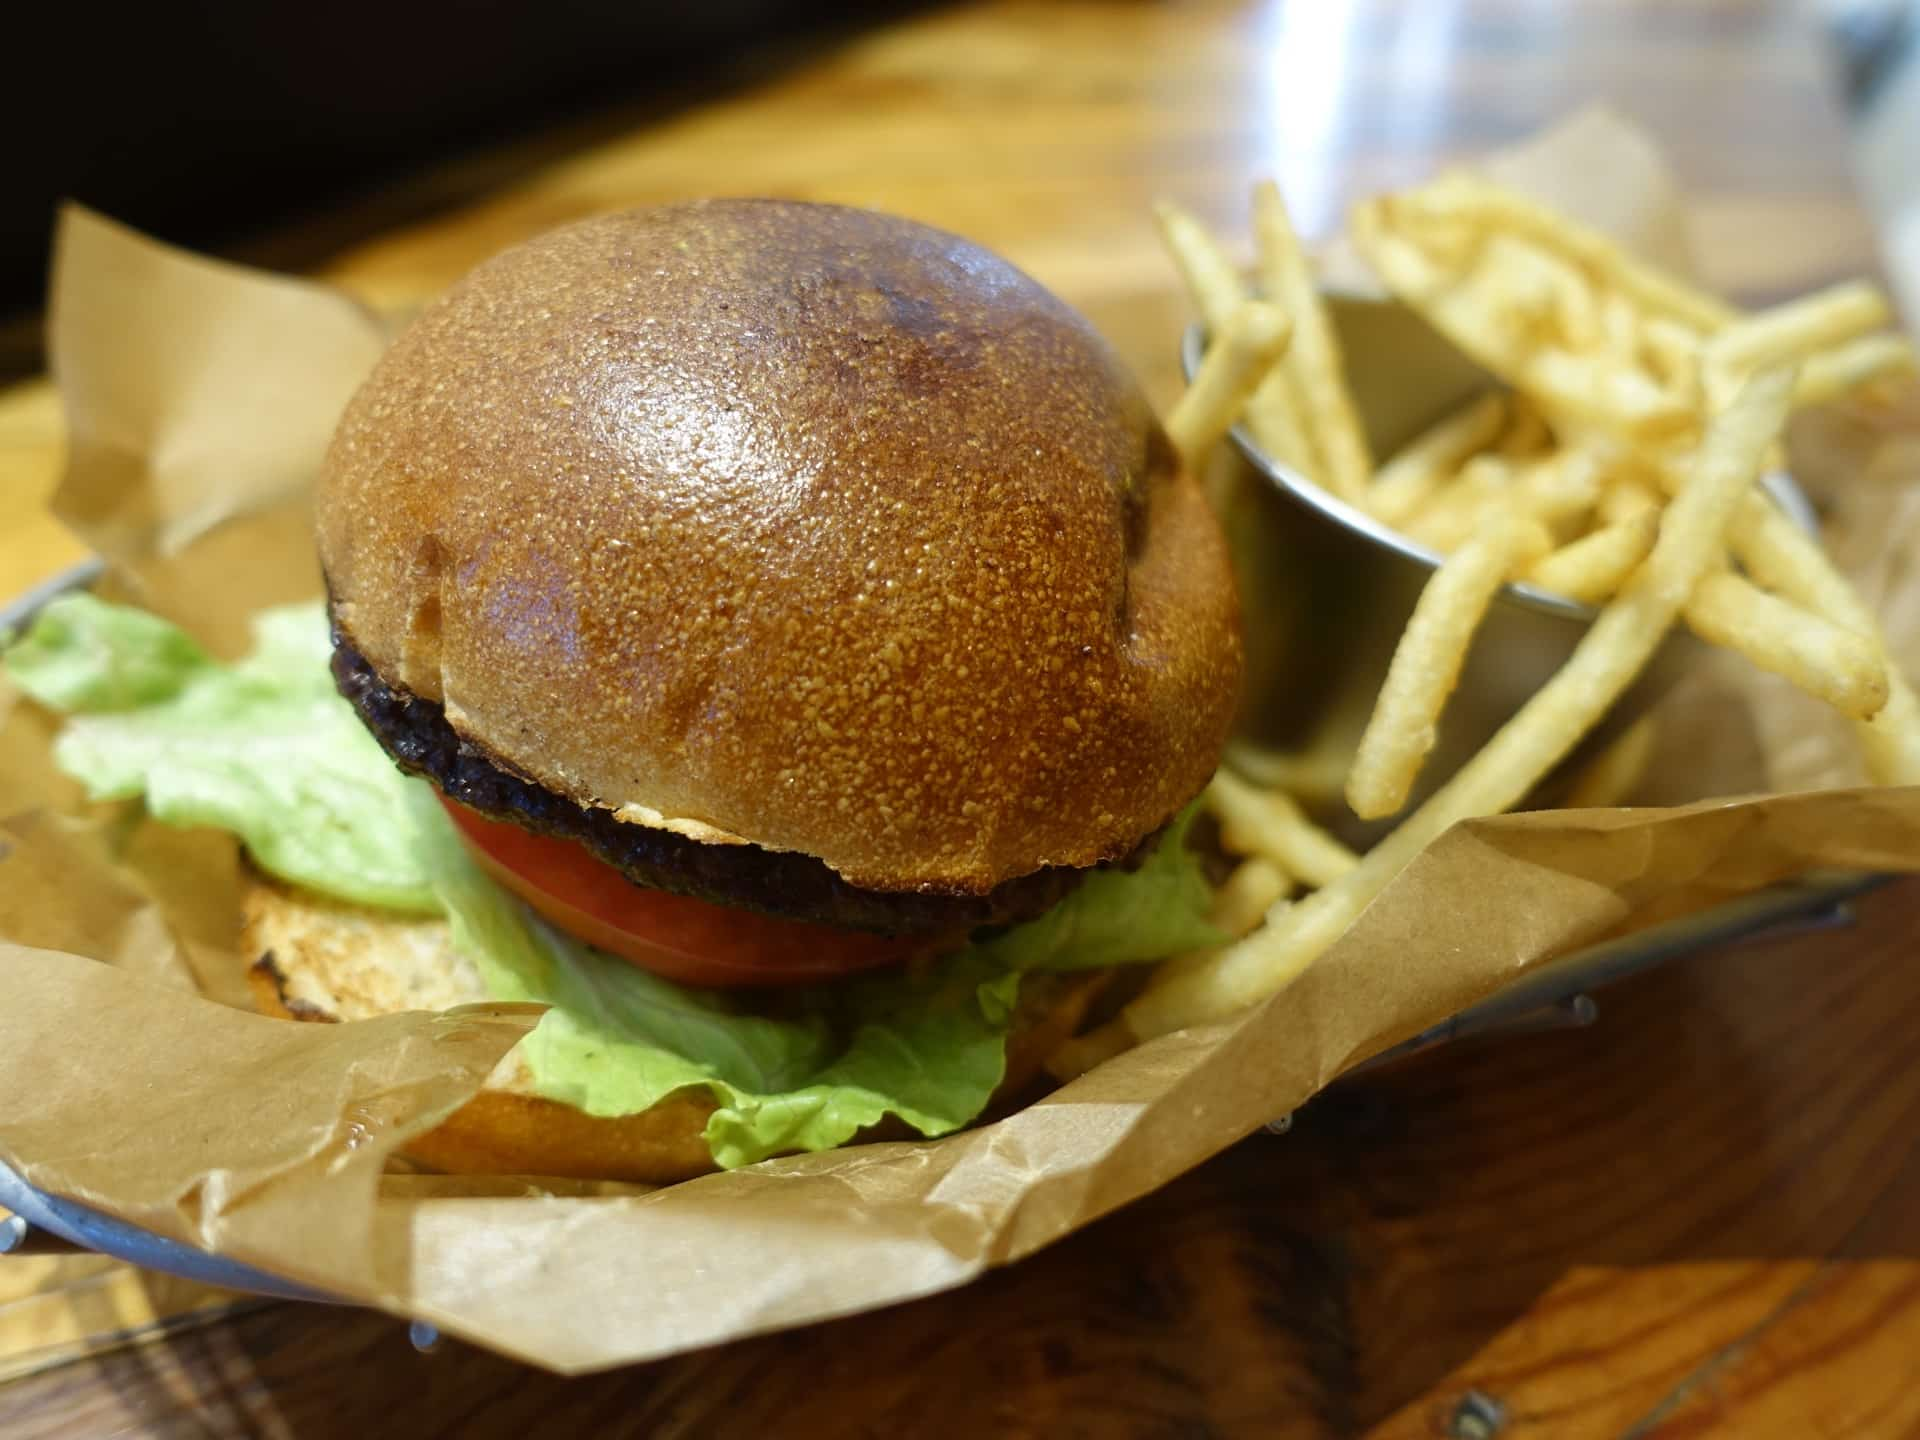 J.S. BURGERS CAFE ミント神戸店 − 三宮の駅前で本格的なハンバーガー!ランチはサラダバーもあるよ